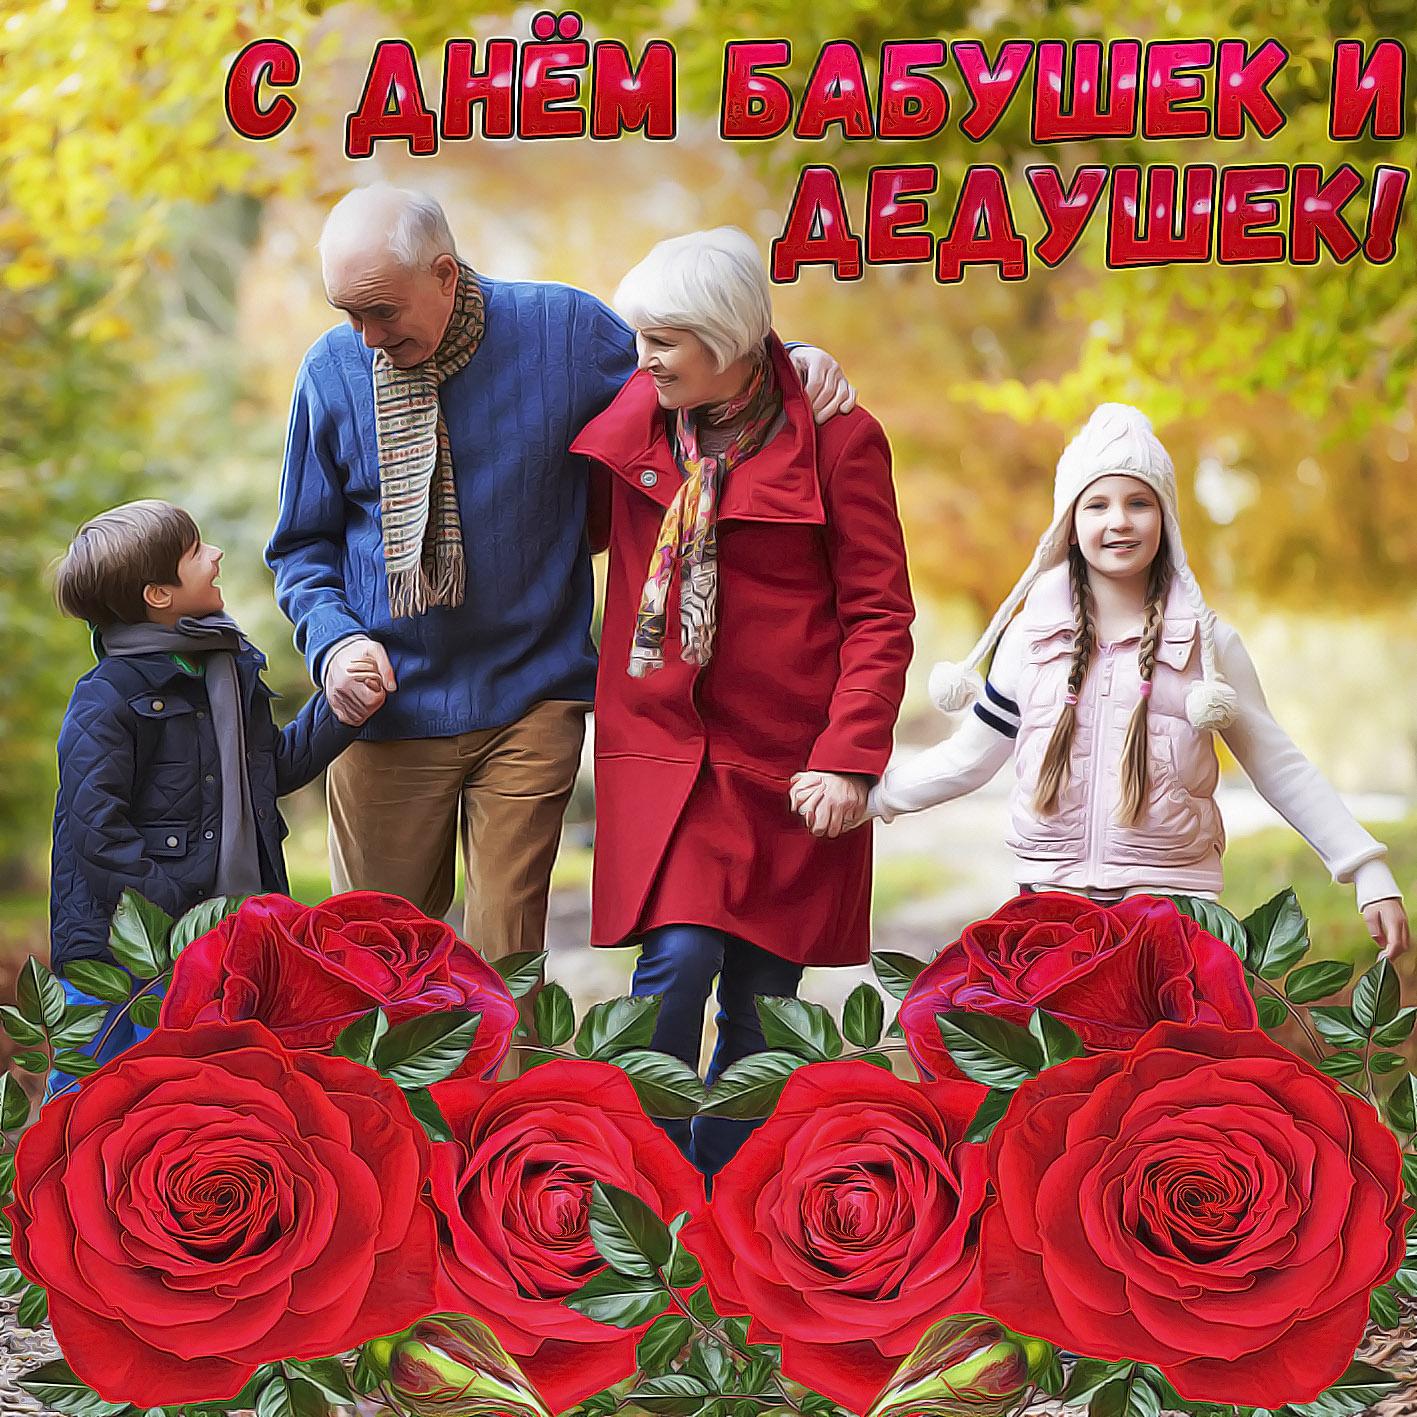 Поздравление на открытке бабушке и дедушке